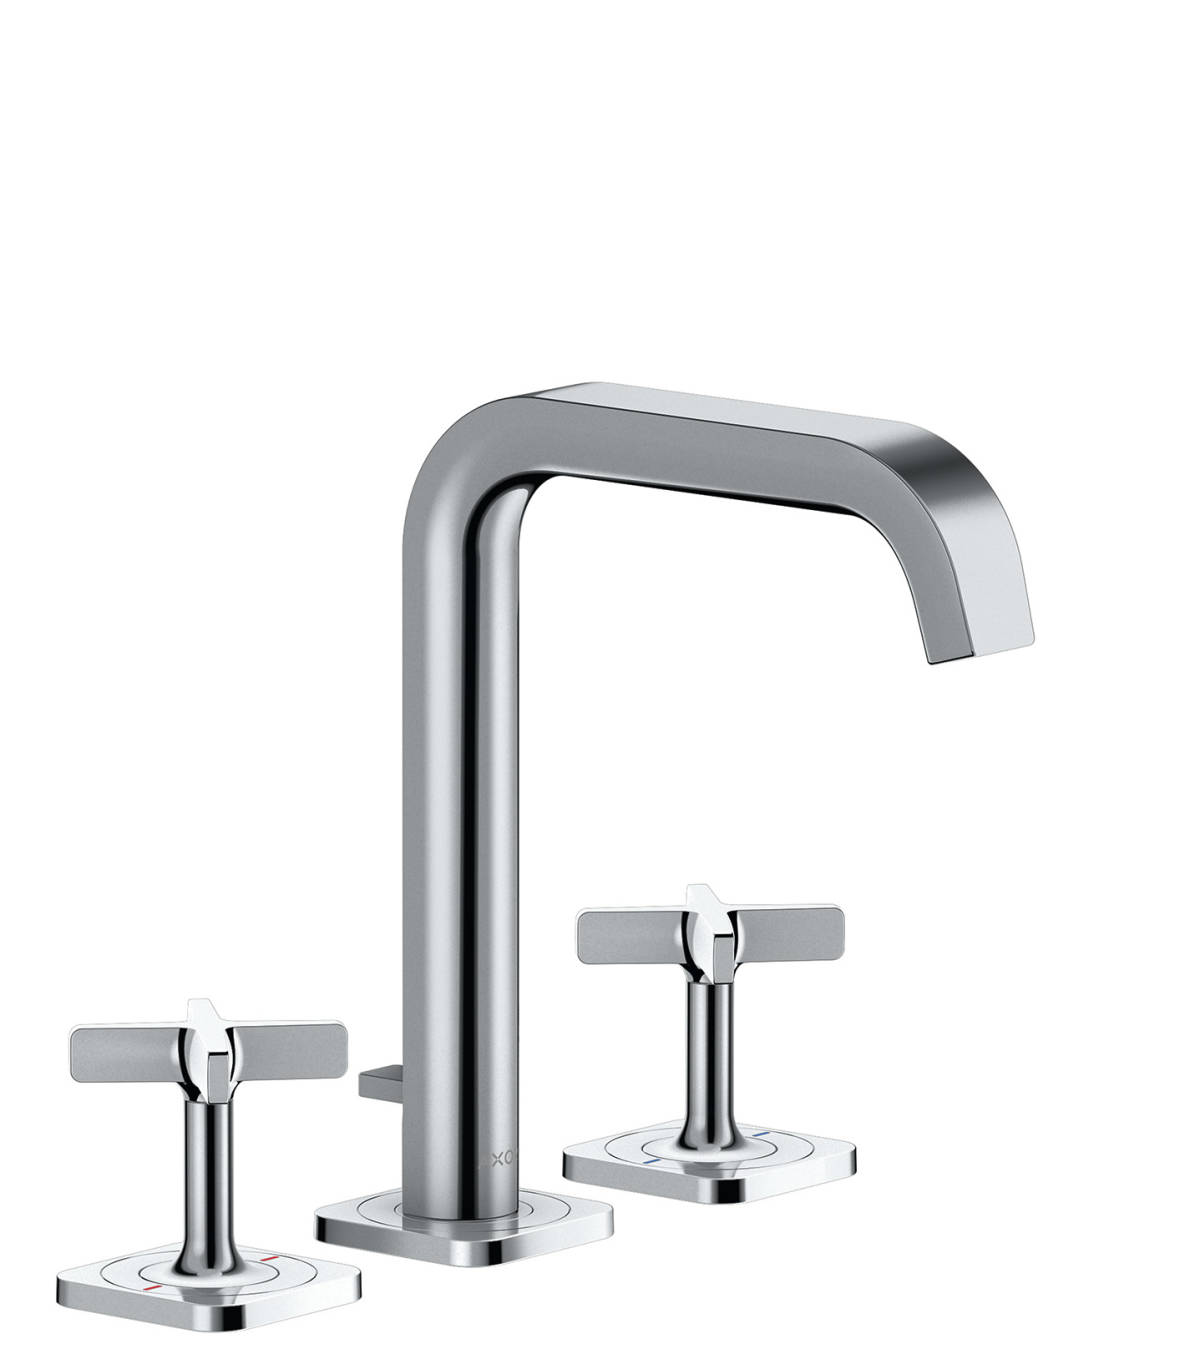 3-hole basin mixer 170 with escutcheons and pop-up waste set, Polished Chrome, 36108020